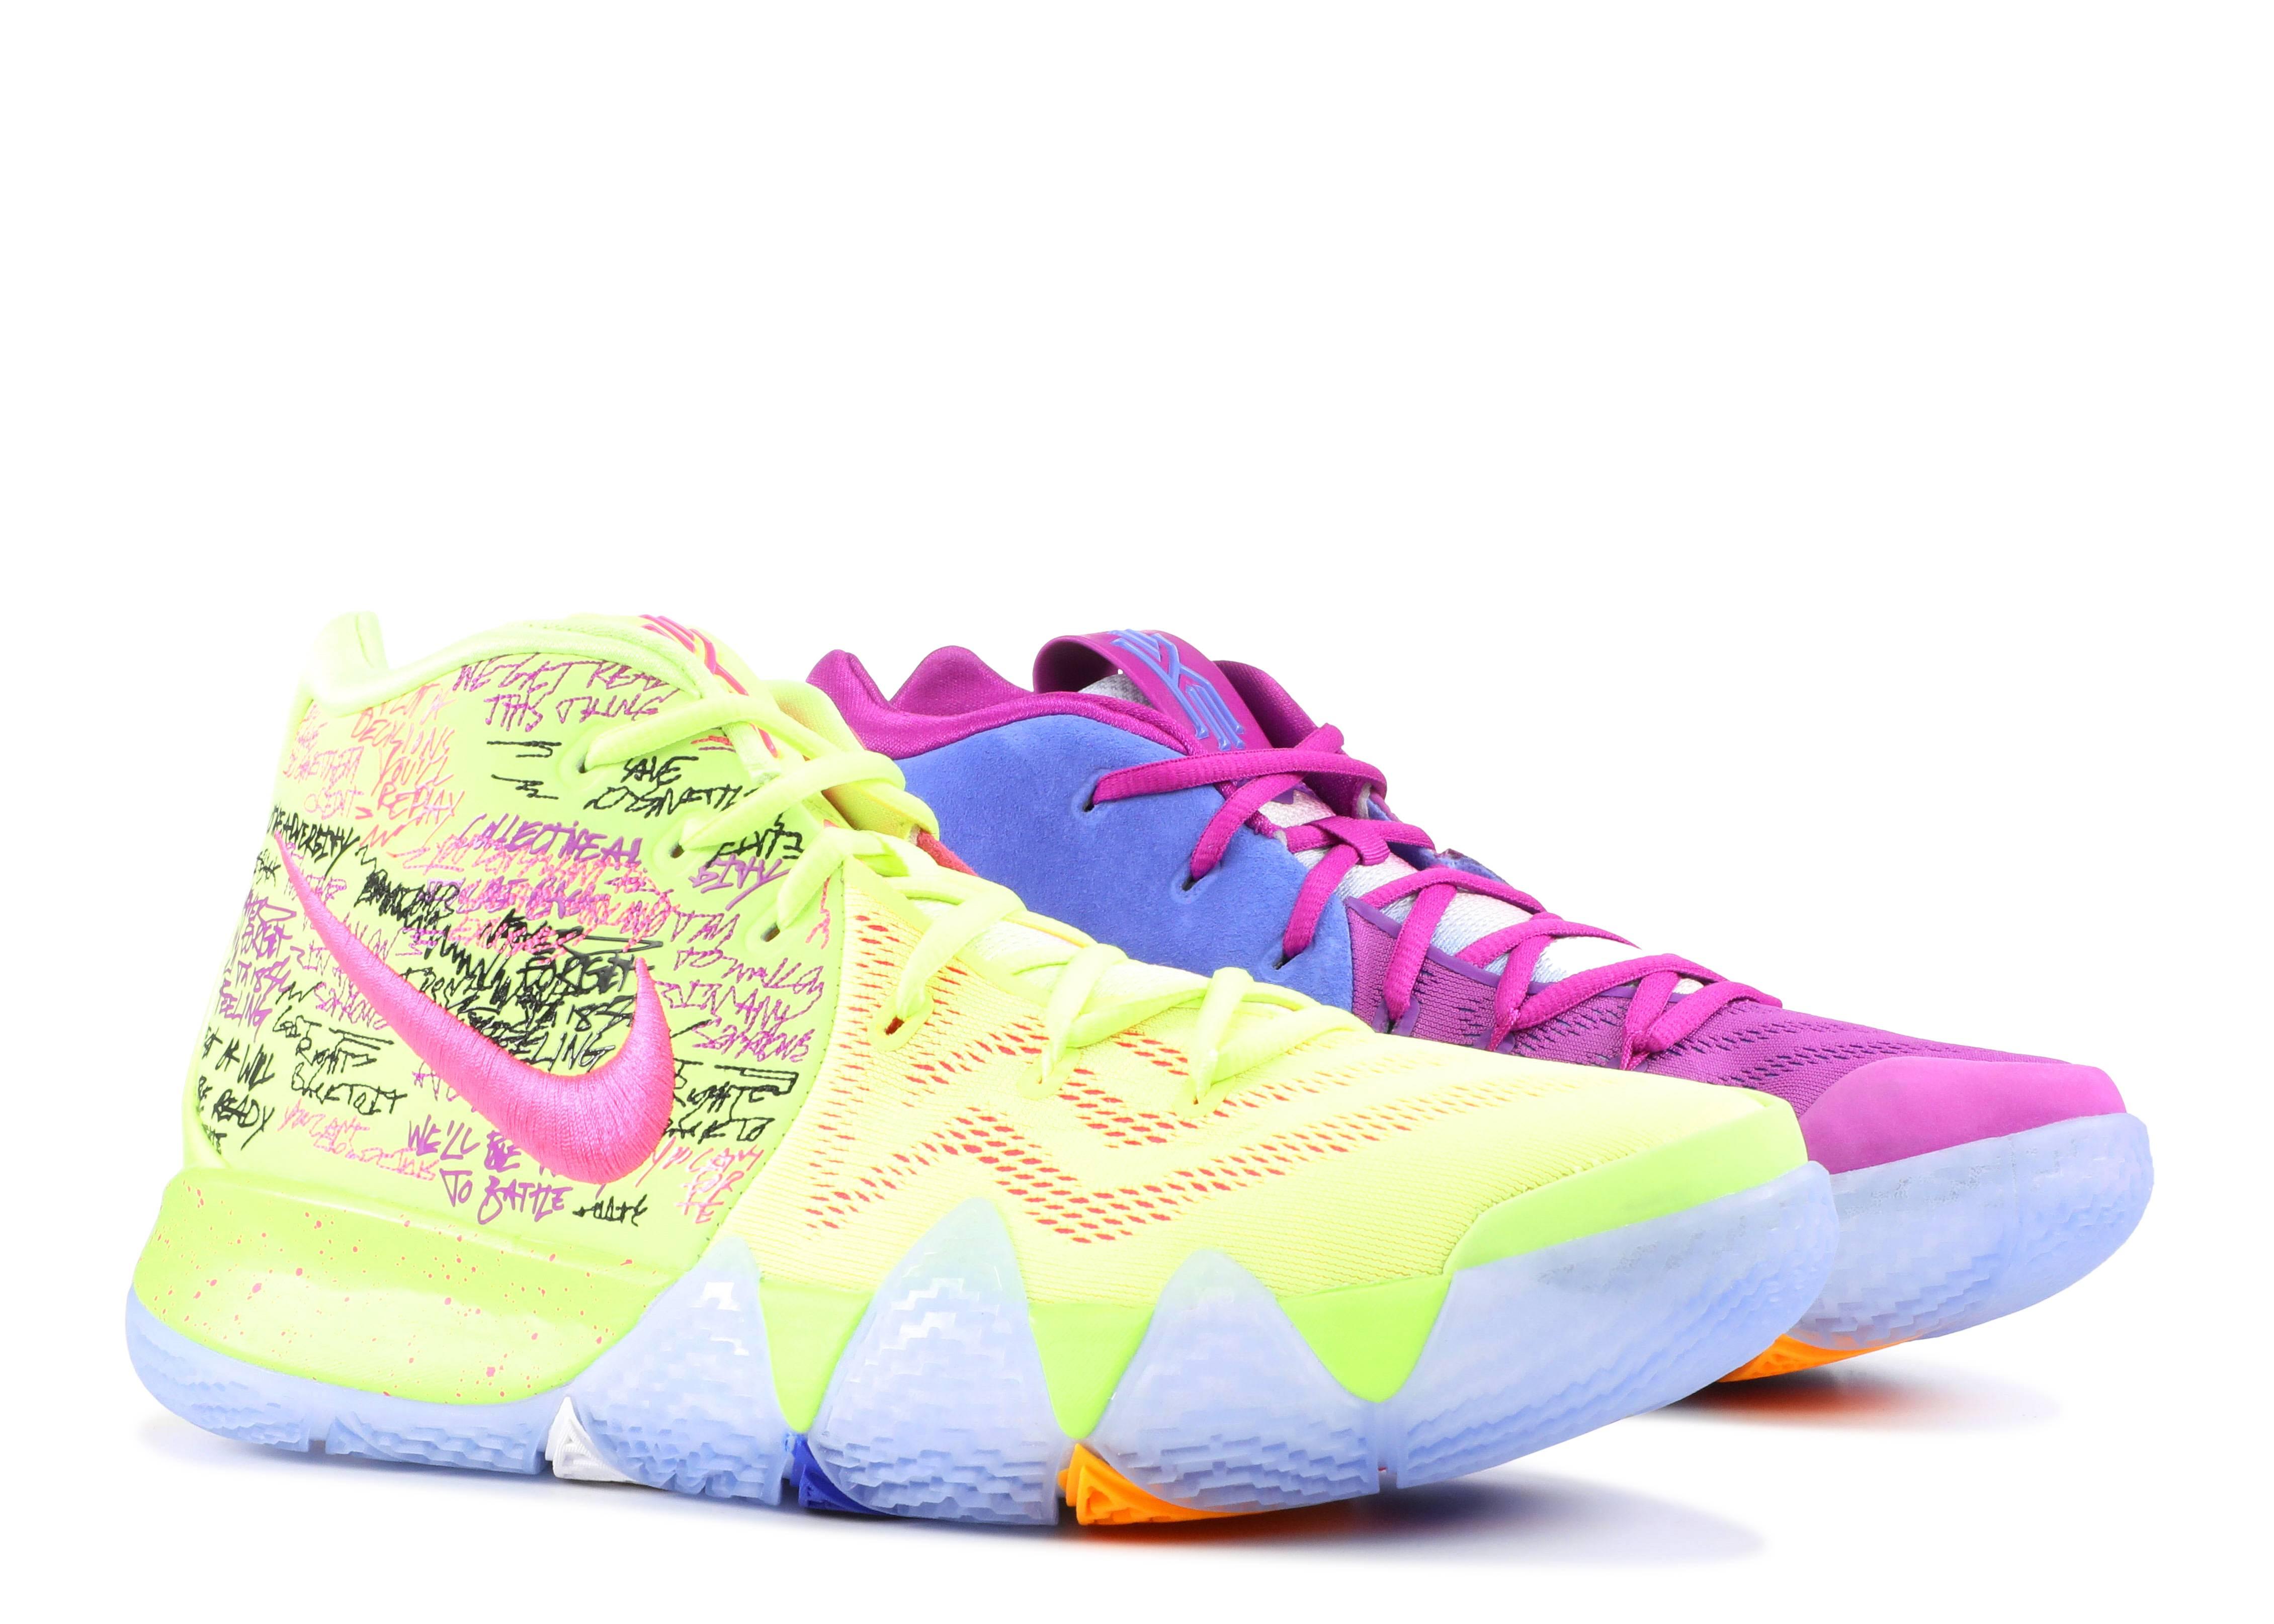 2ccf3dccdaaa Kyrie Irving - Nike Basketball - Nike